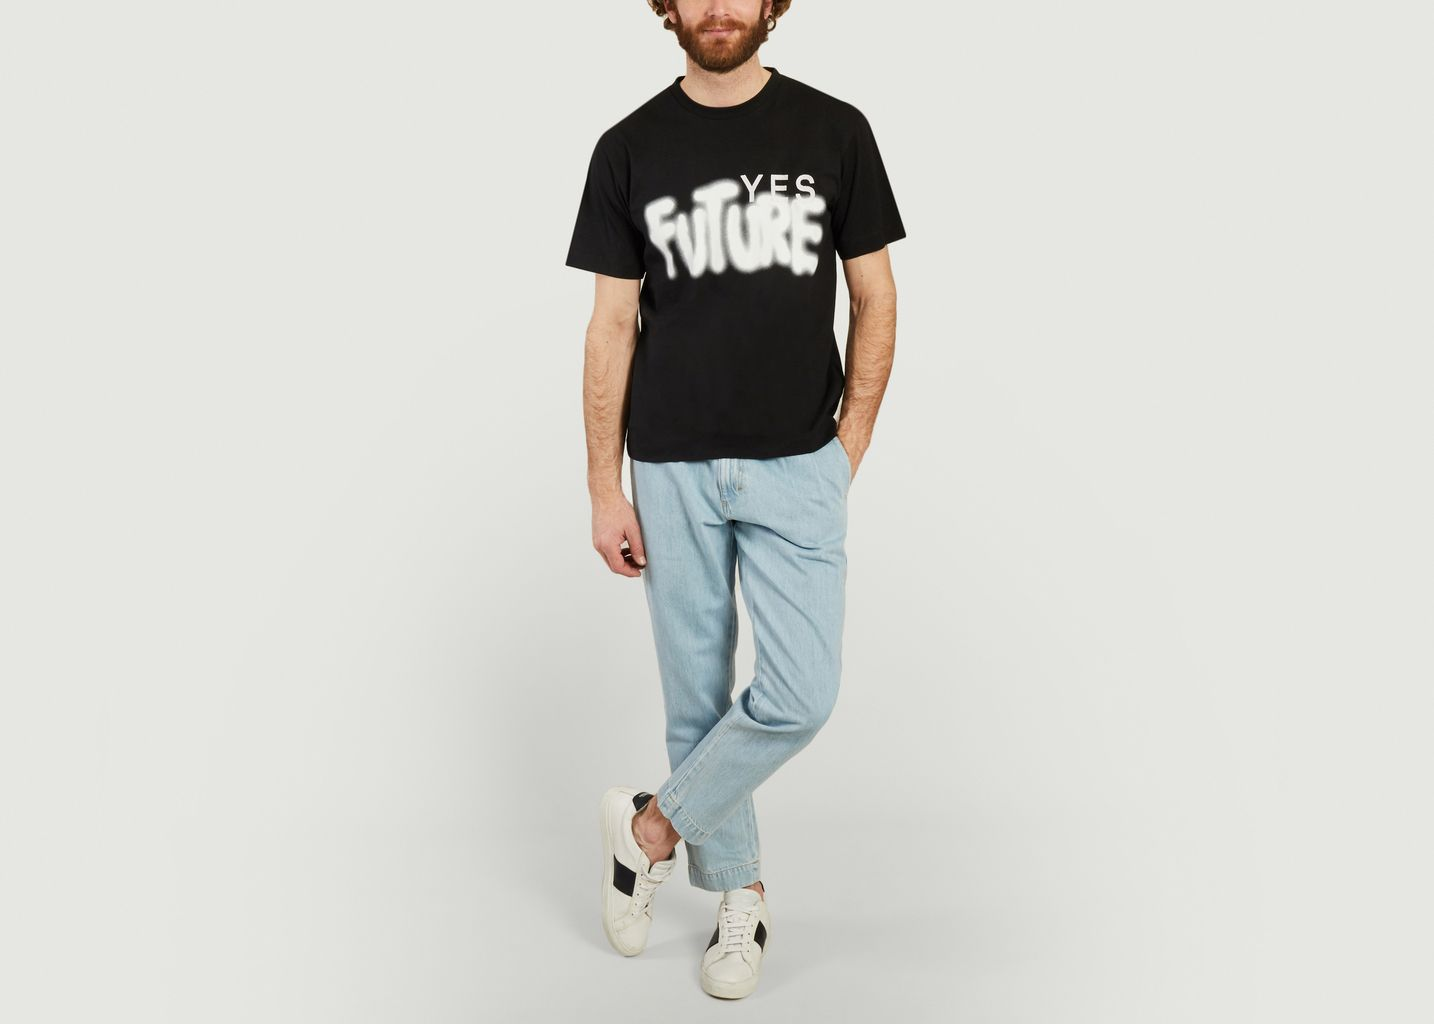 T-shirt Wonder Yes Future - Études